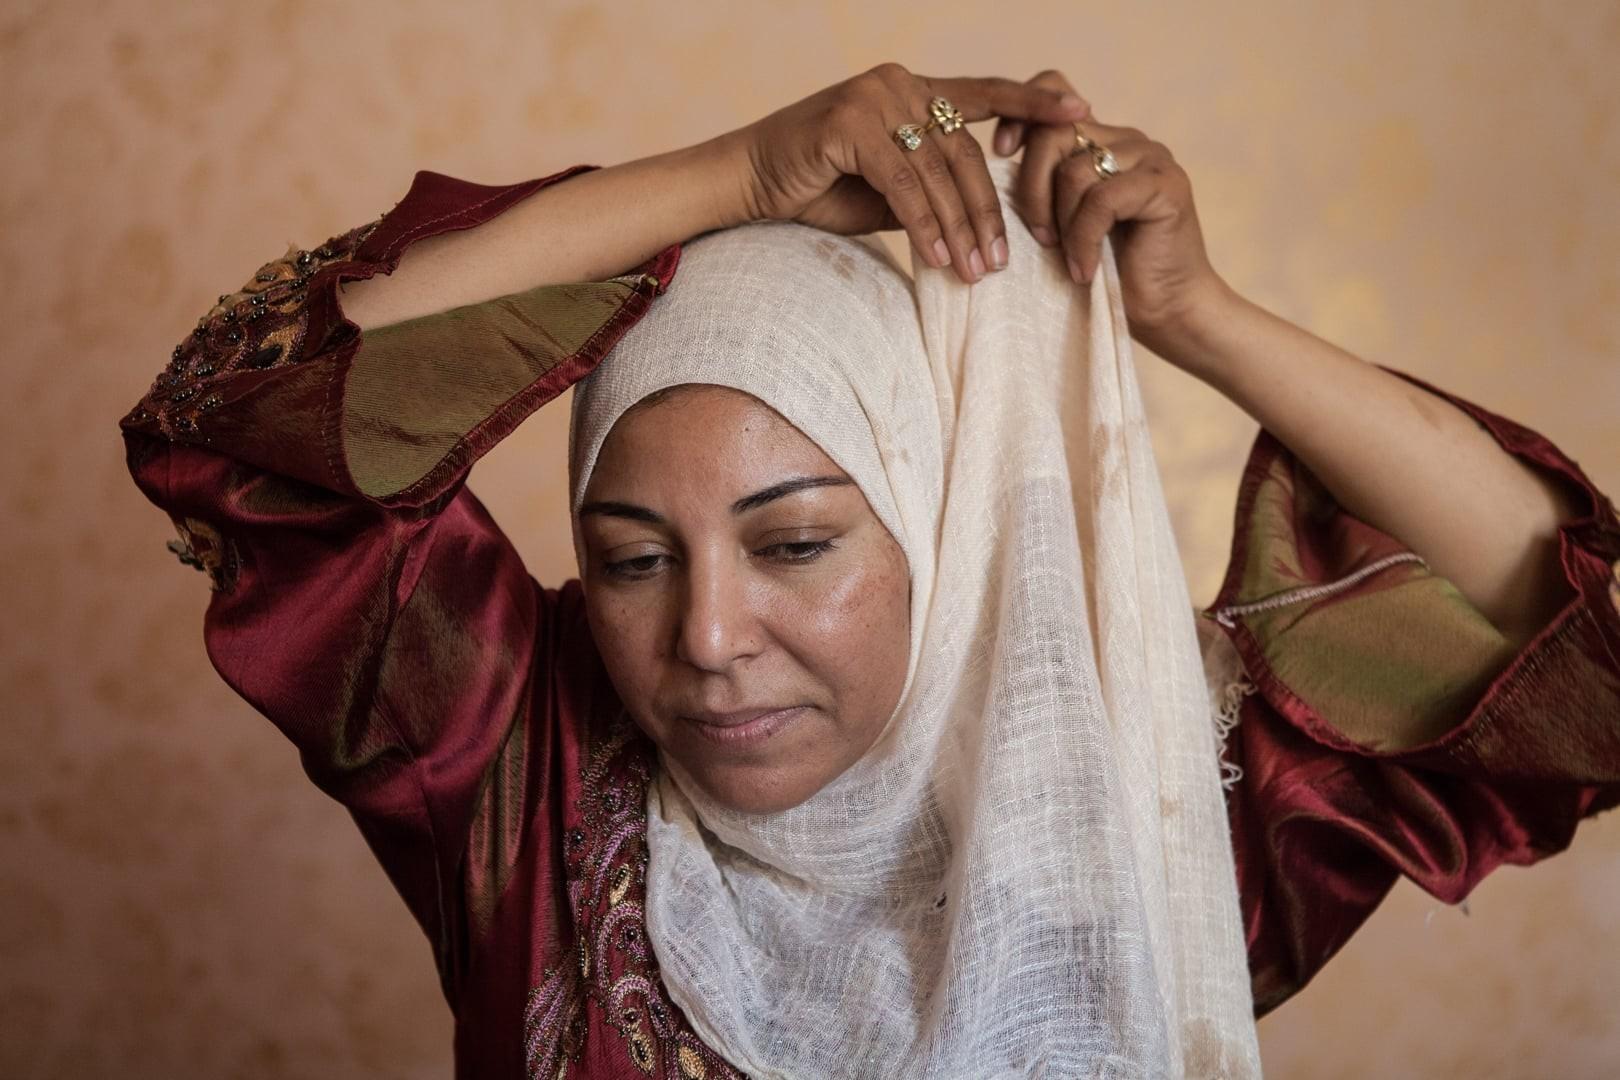 Amélie Losier.    Nadia Ali Abdala, 42 Jahre   Sadat City, Ägypten, 2014